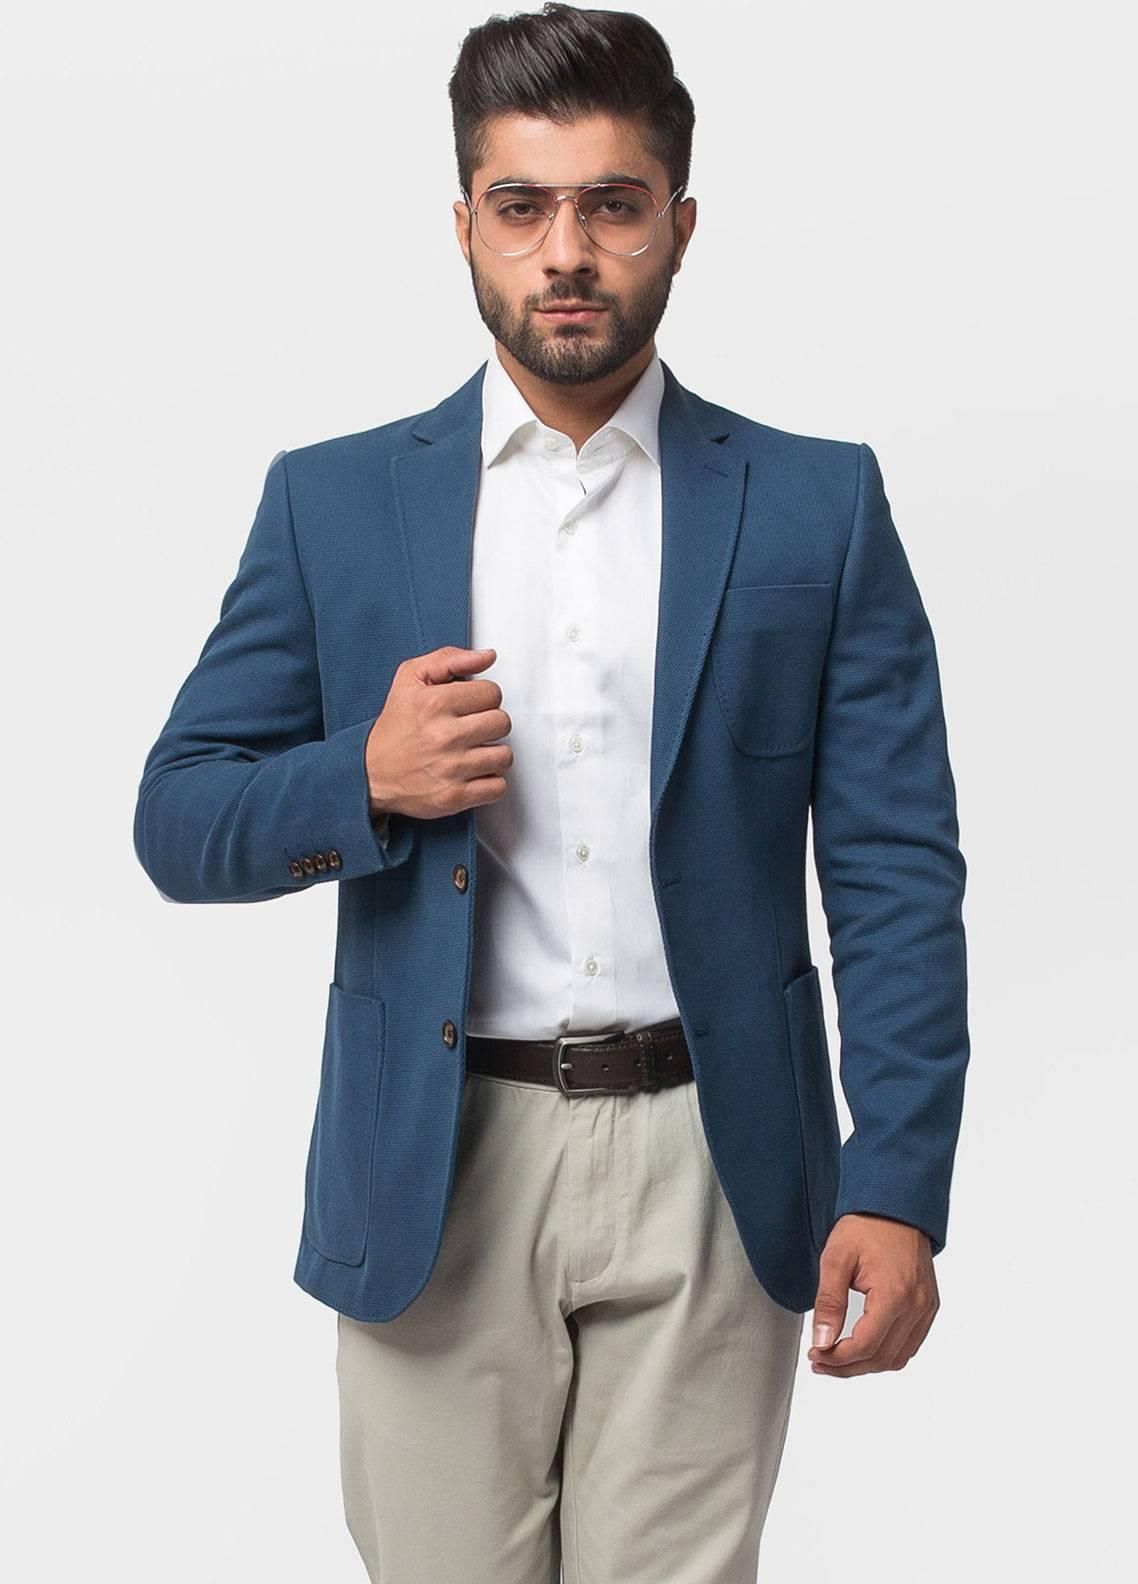 Brumano Cotton Casual Men Blazer - Ink Blue BLZ-506